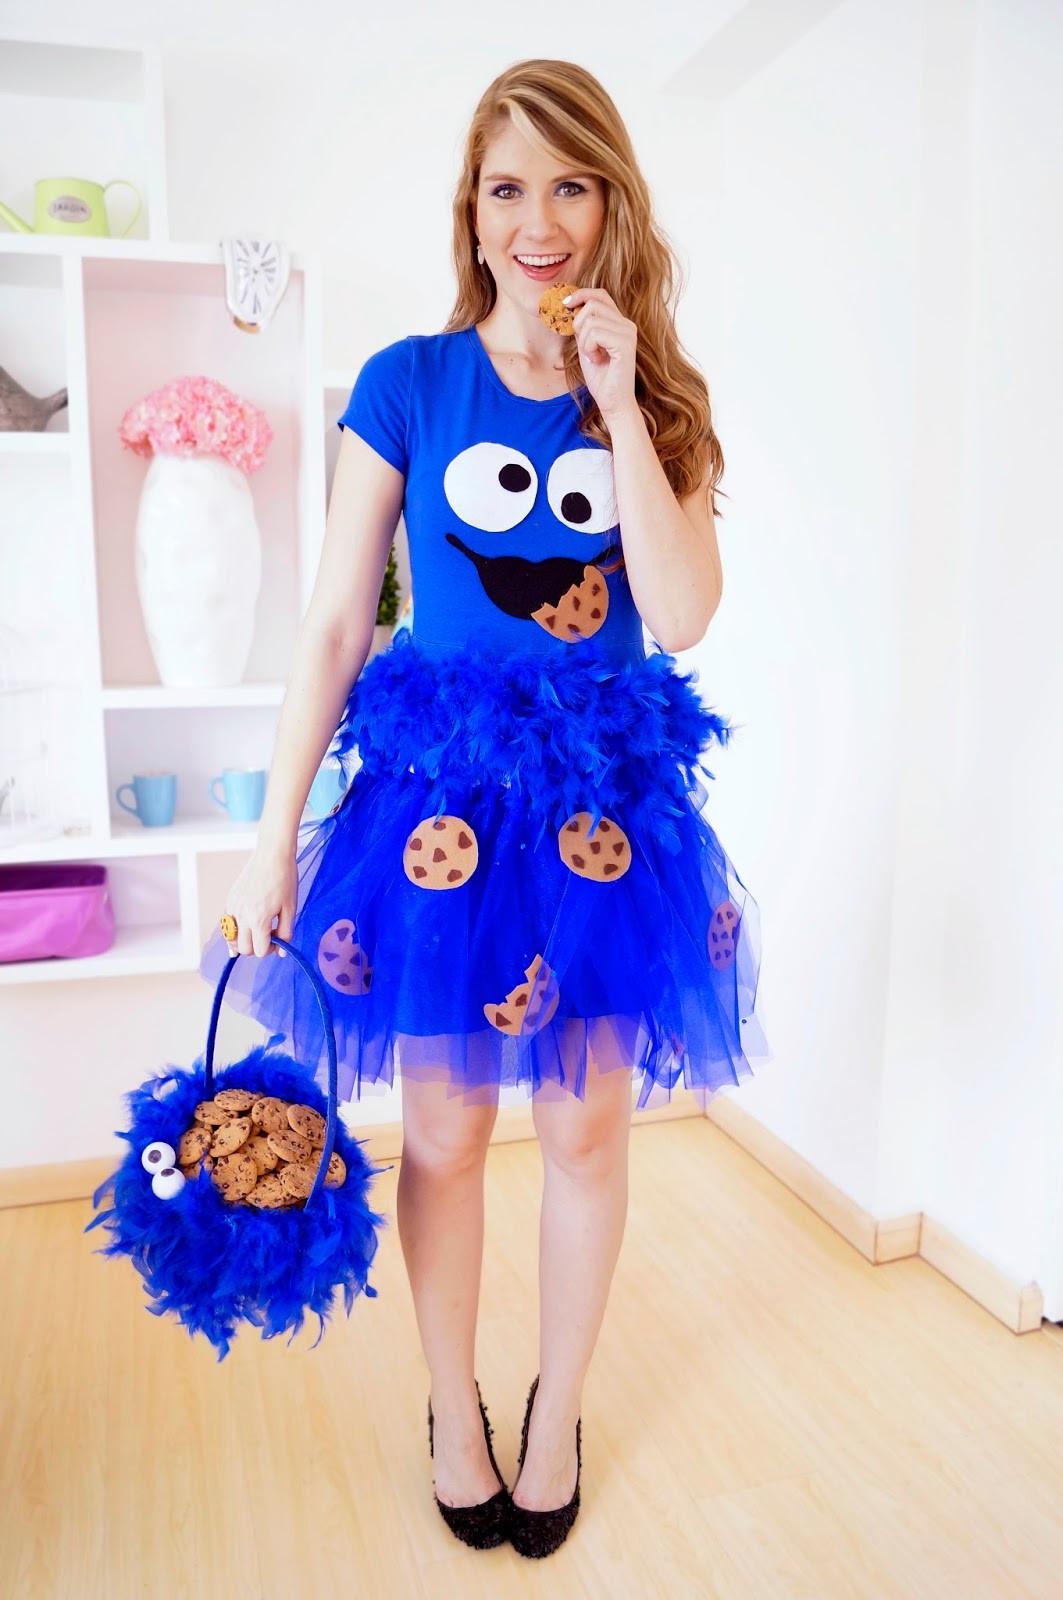 Diy Halloween Kostüm  The 15 Best DIY Halloween Costumes for Adults